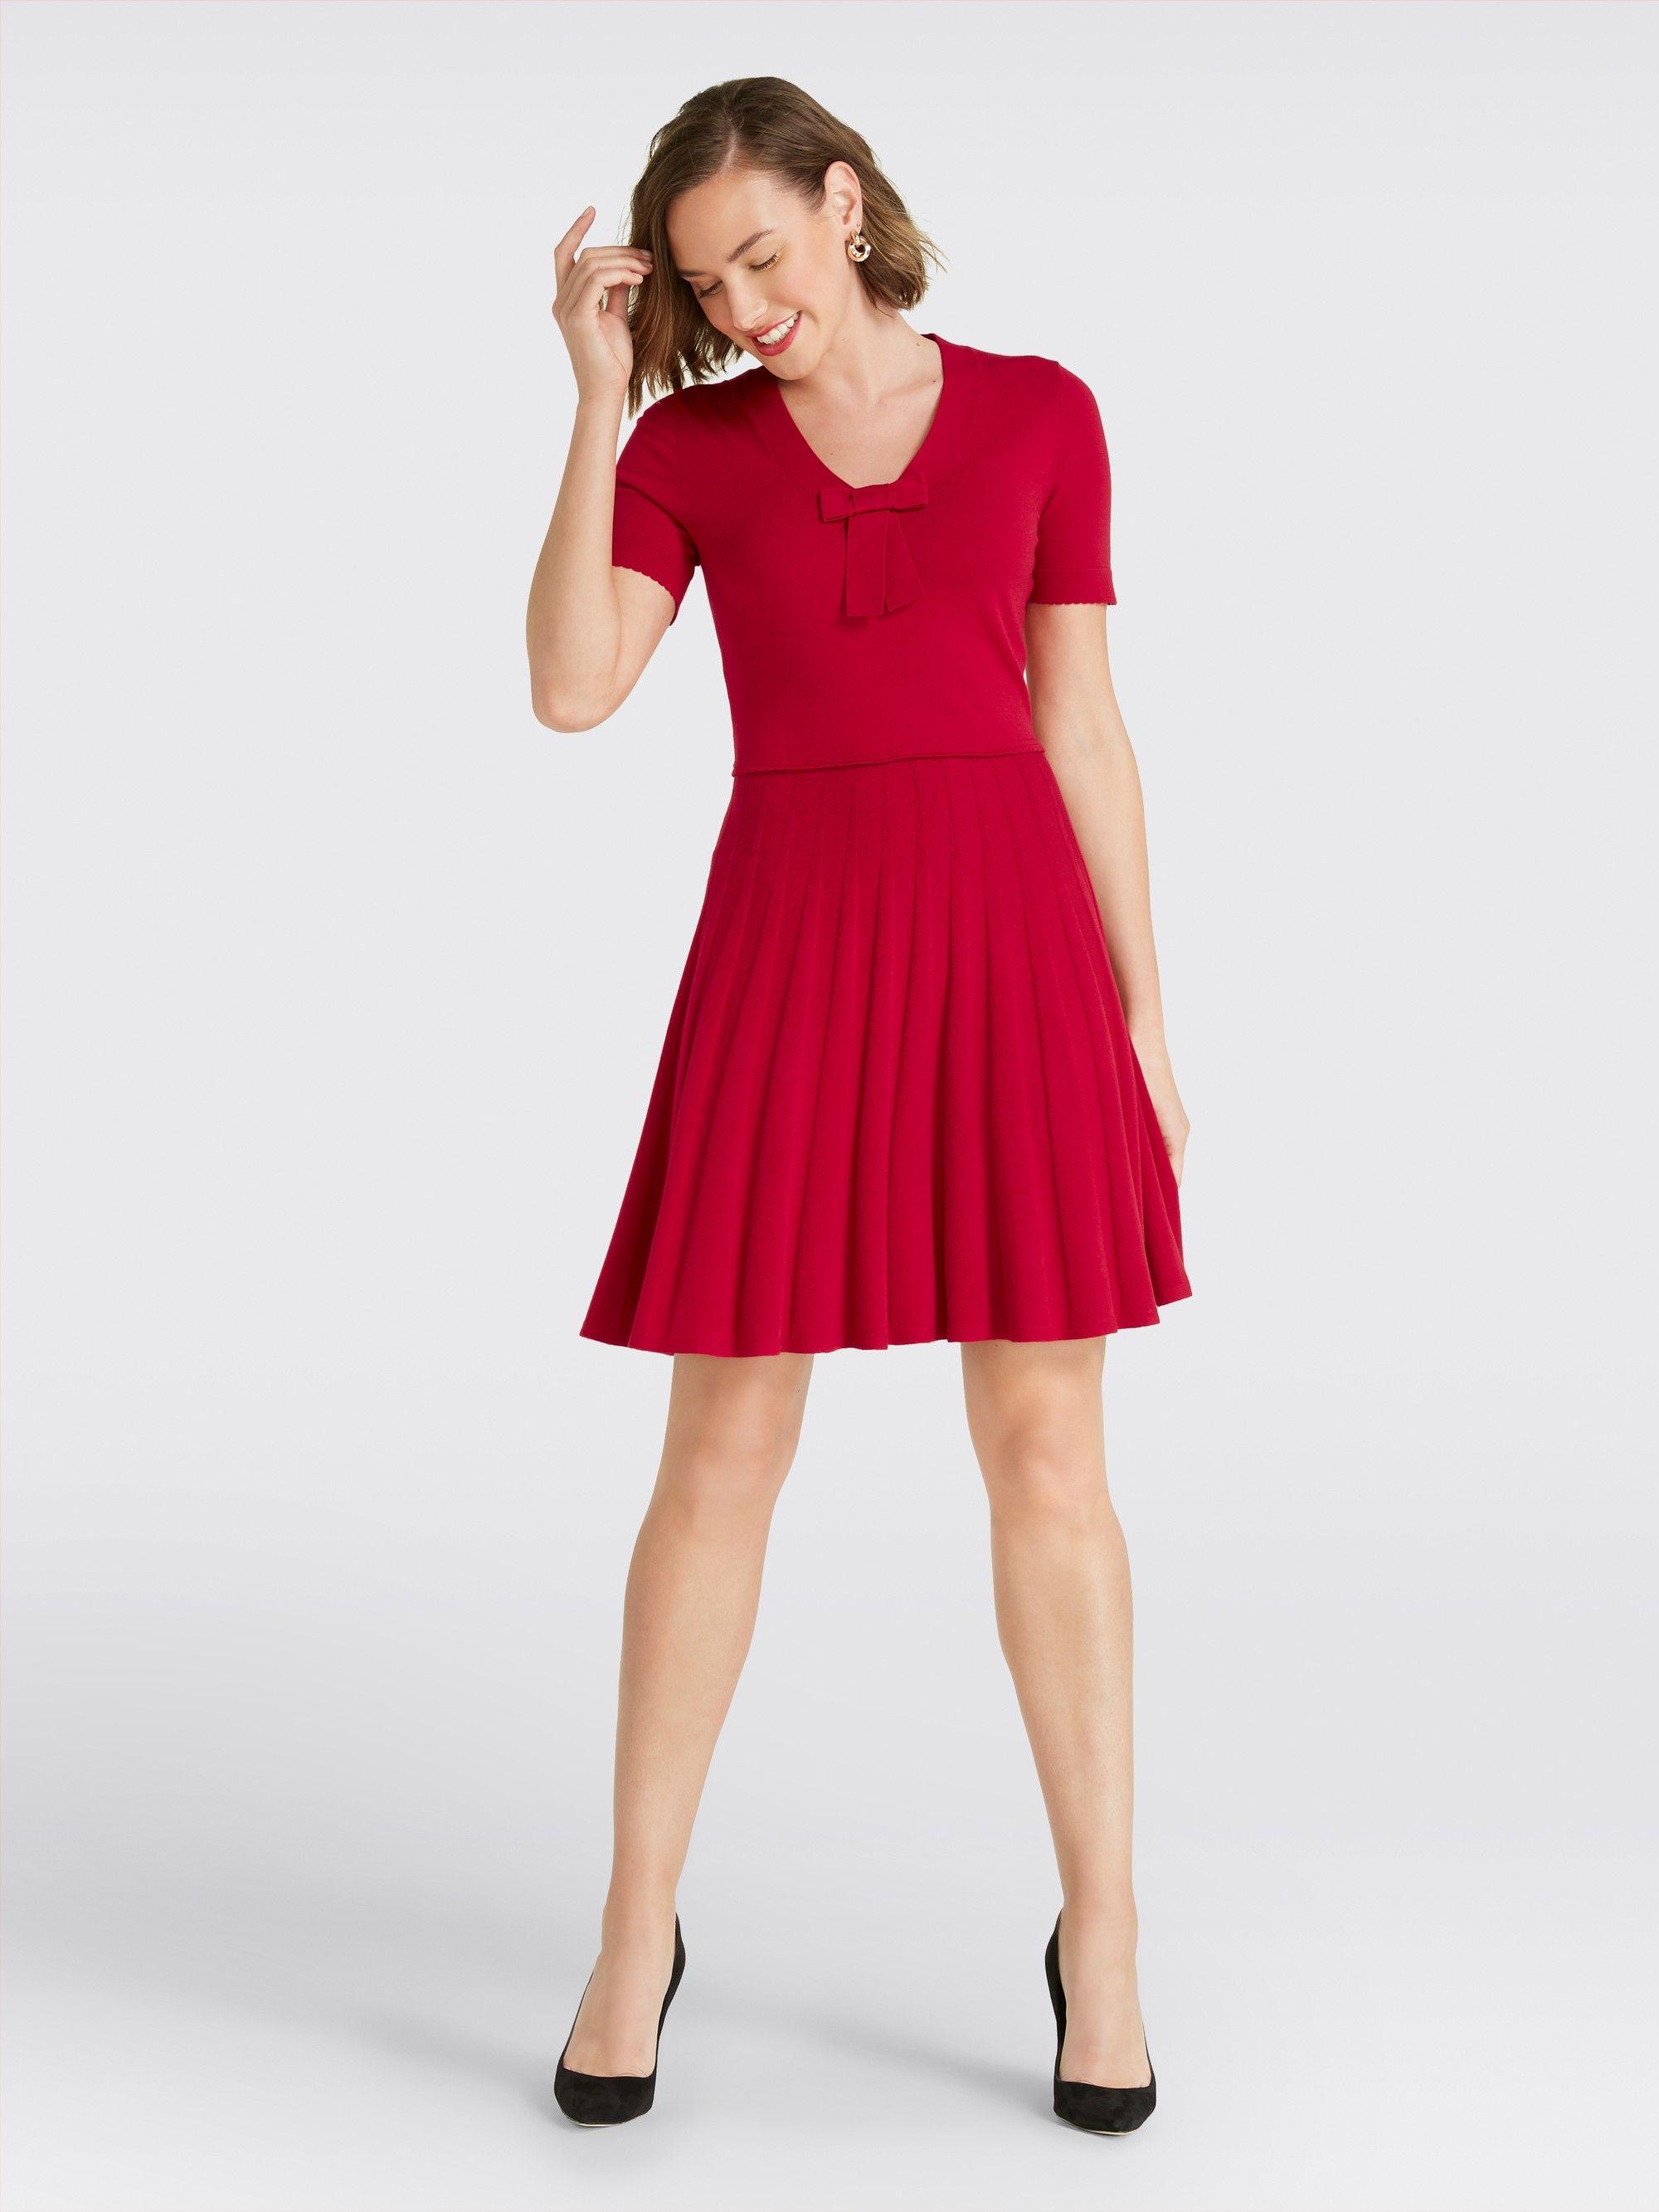 fa889aea039 Draper James - Bow Knit Dress